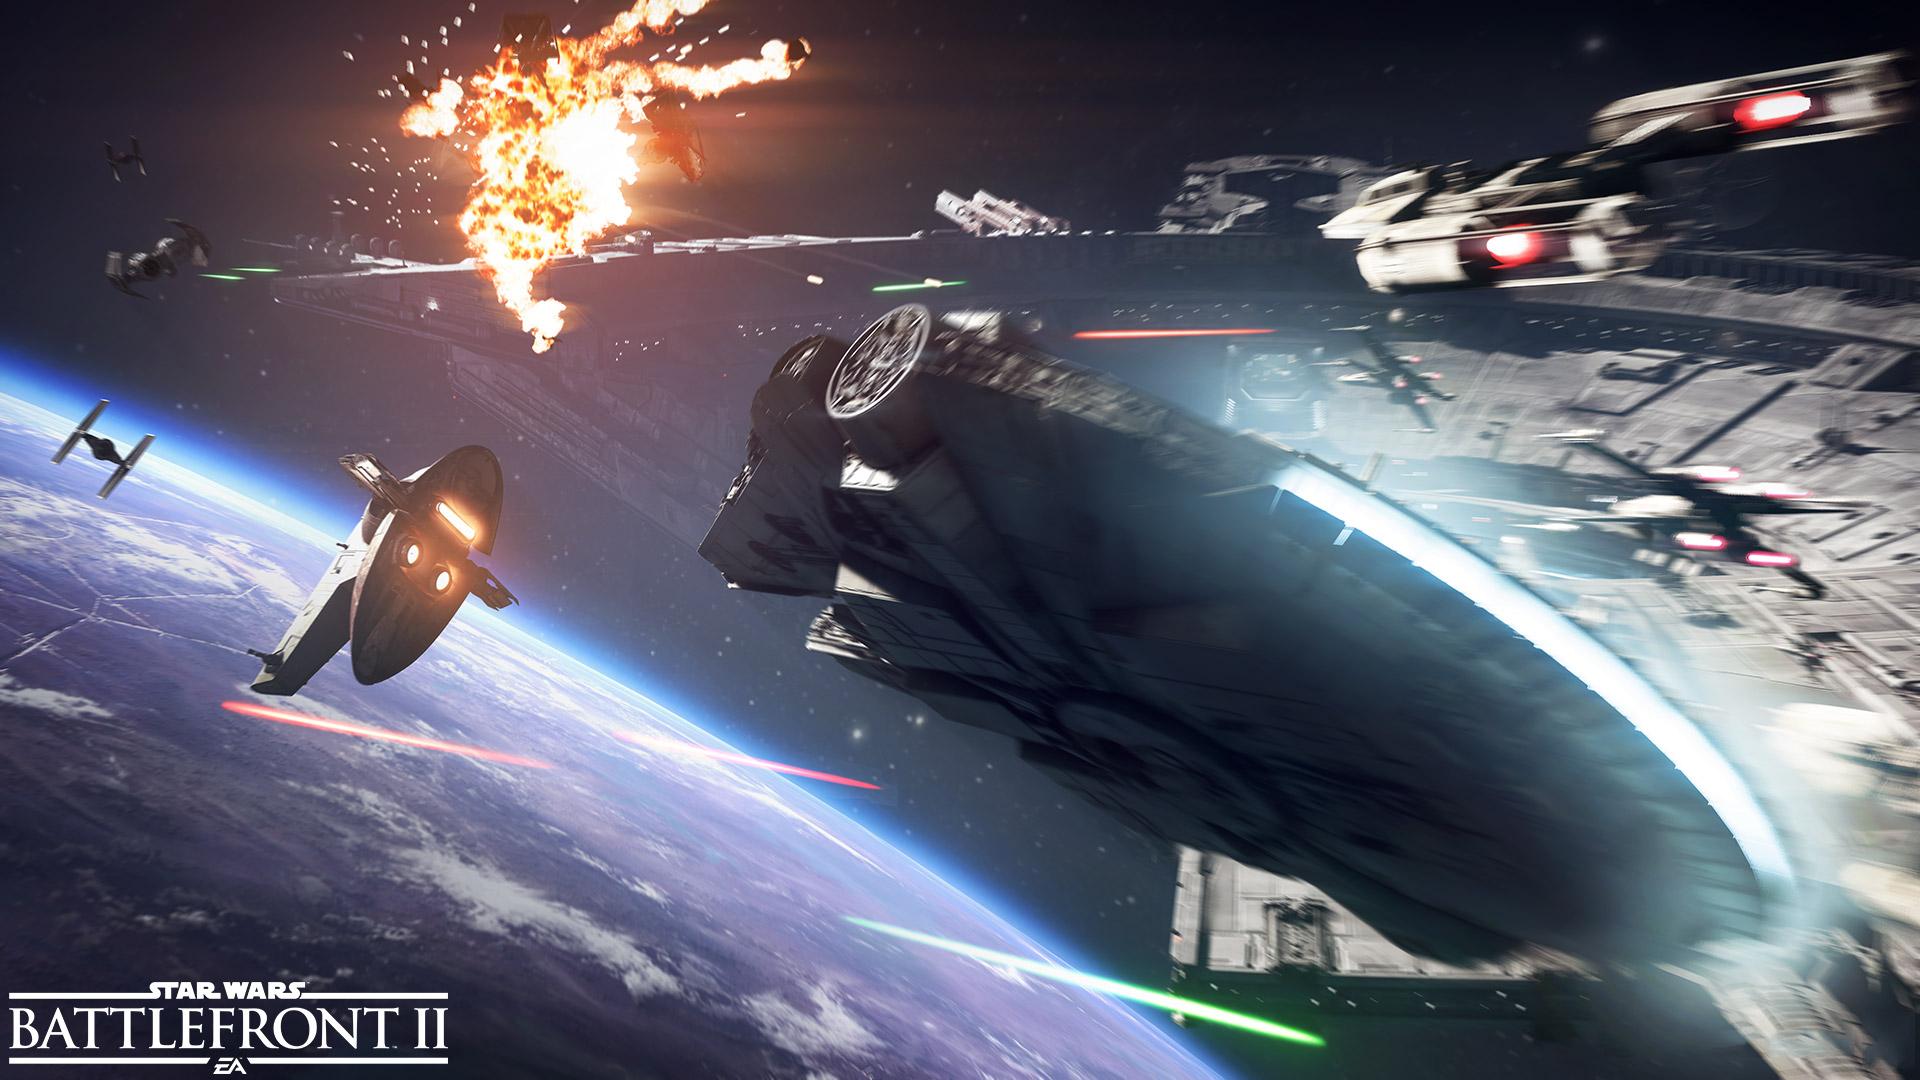 Star Wars Battlefront Ii Wallpaper In 1920x1080